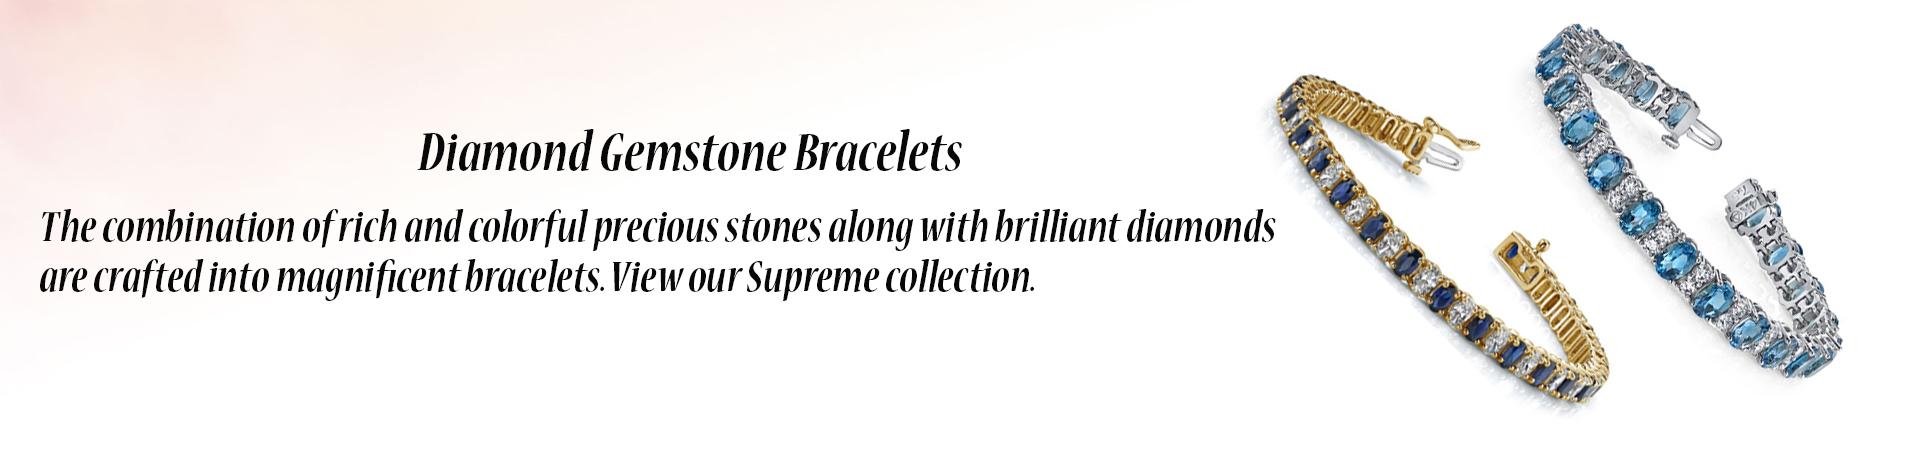 Diamond Gemstone Bracelets